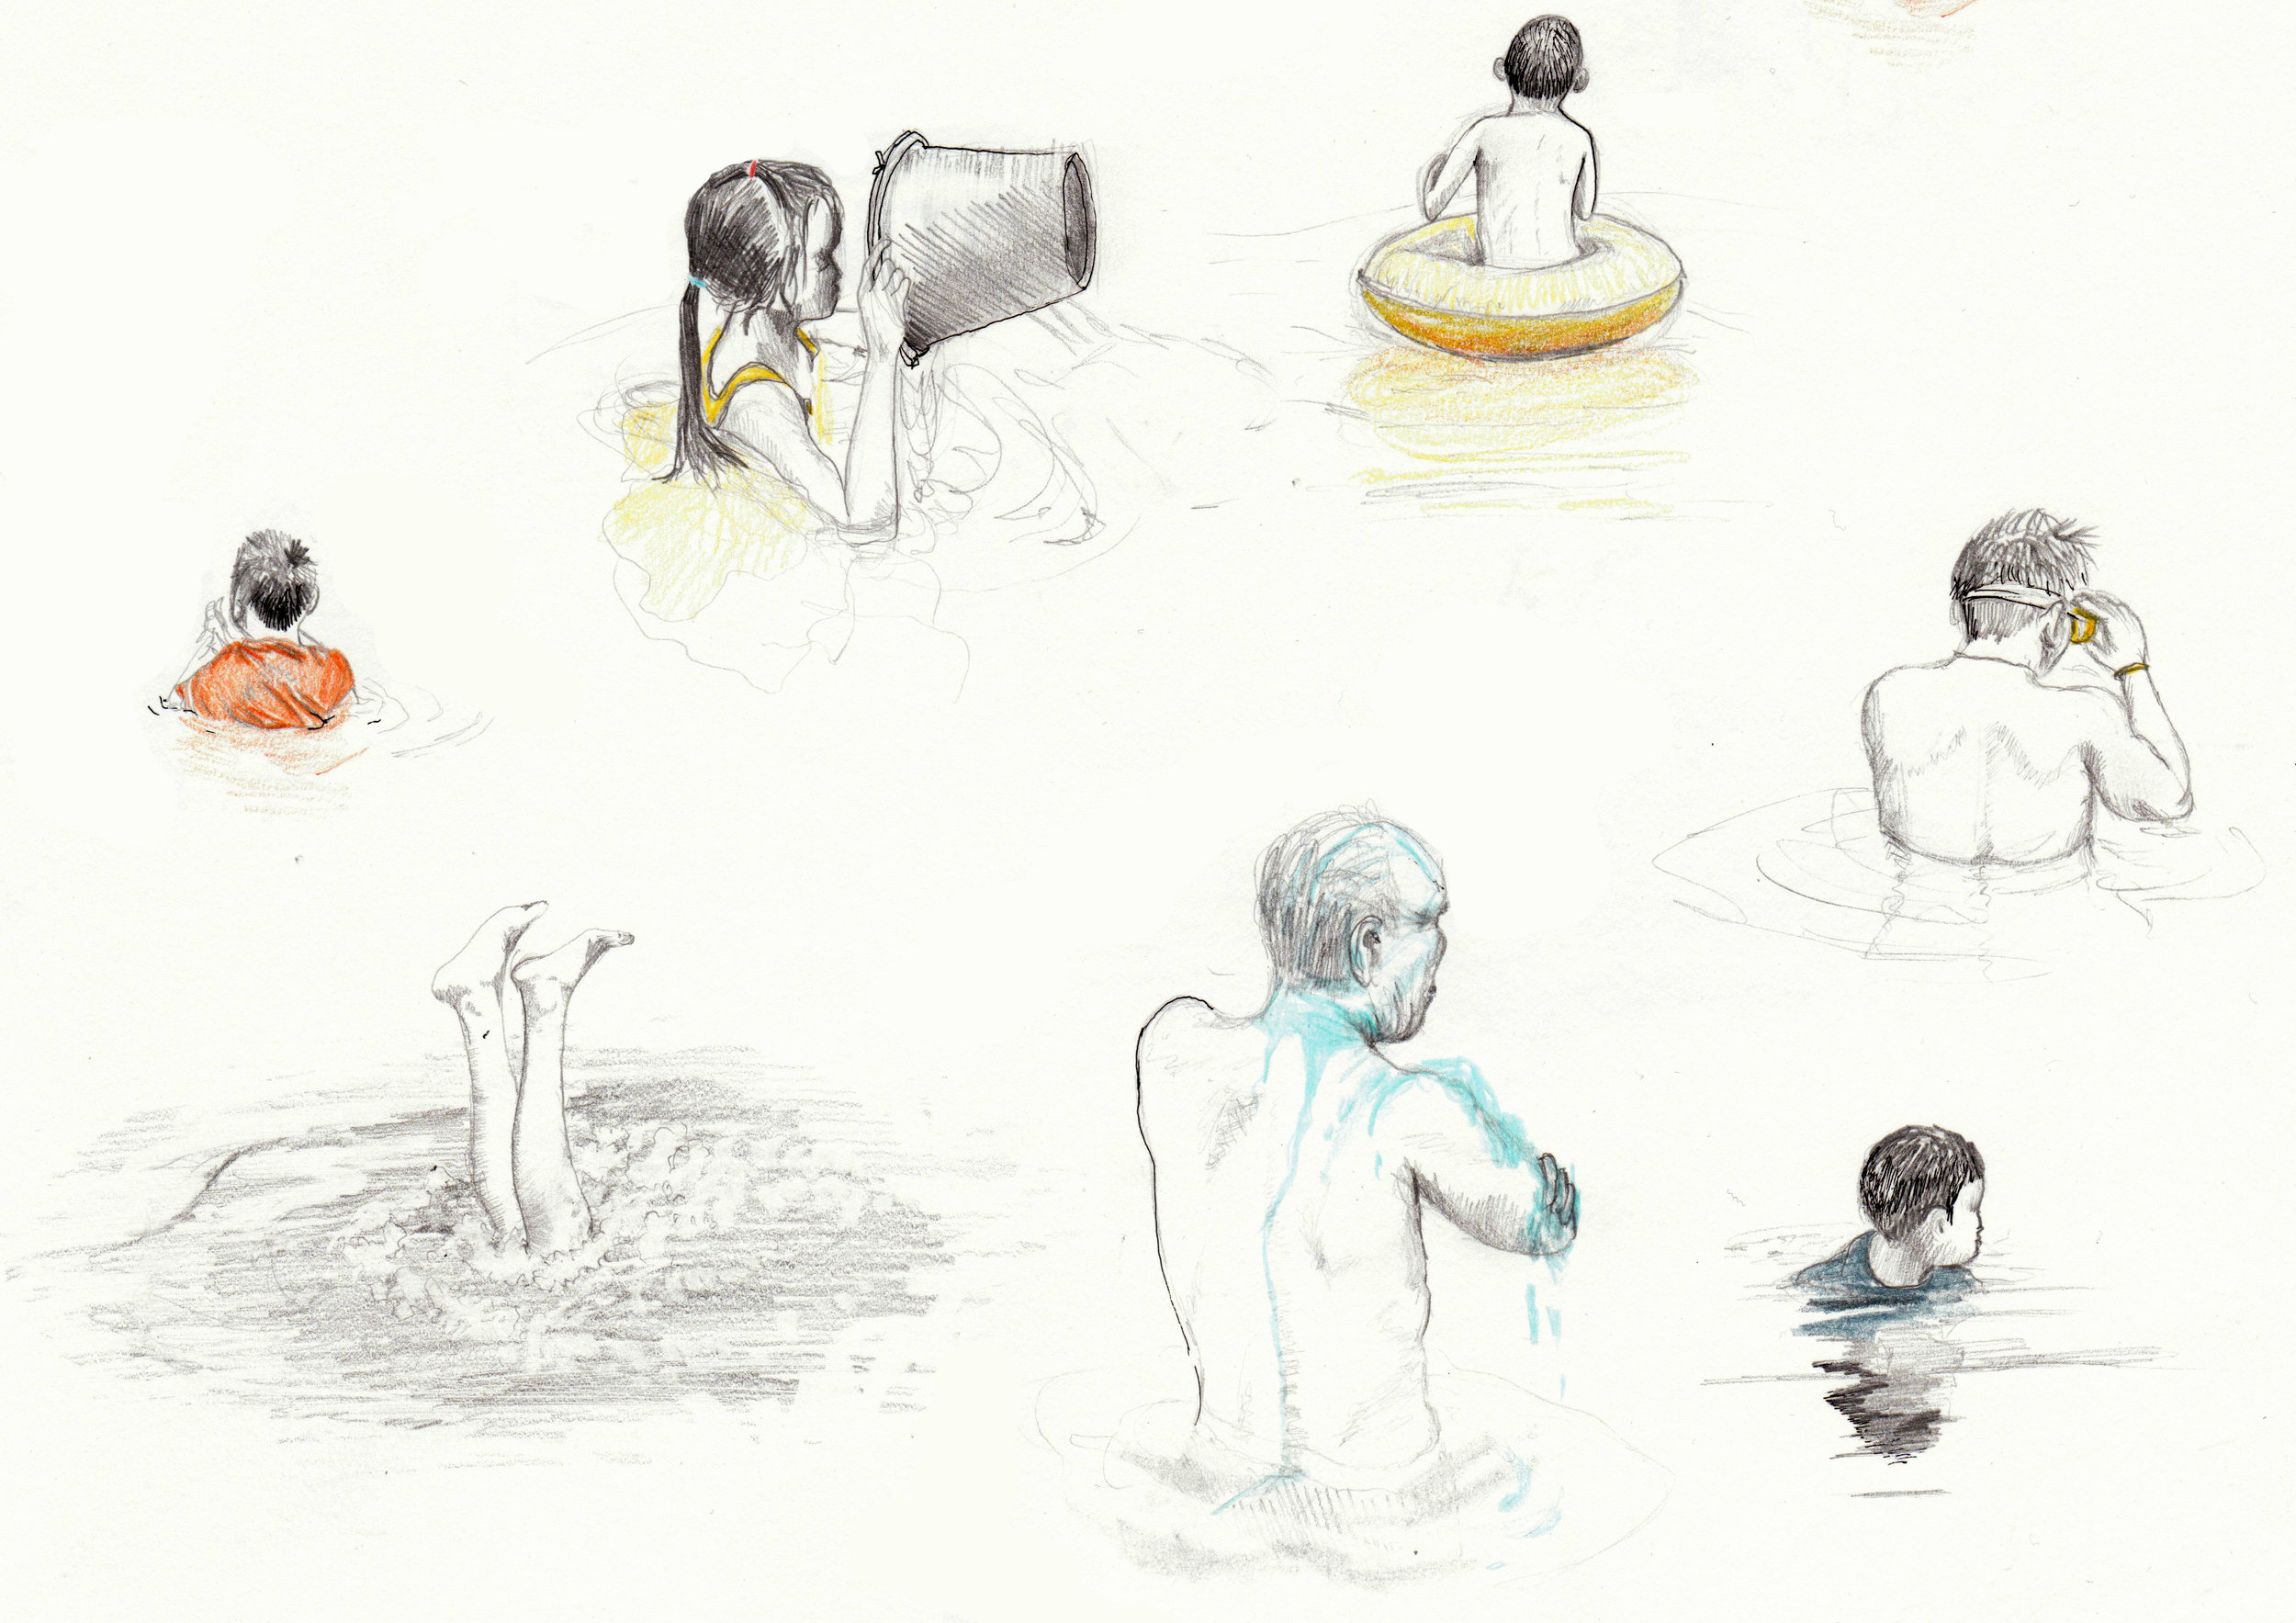 Life in the Mekong River.jpg